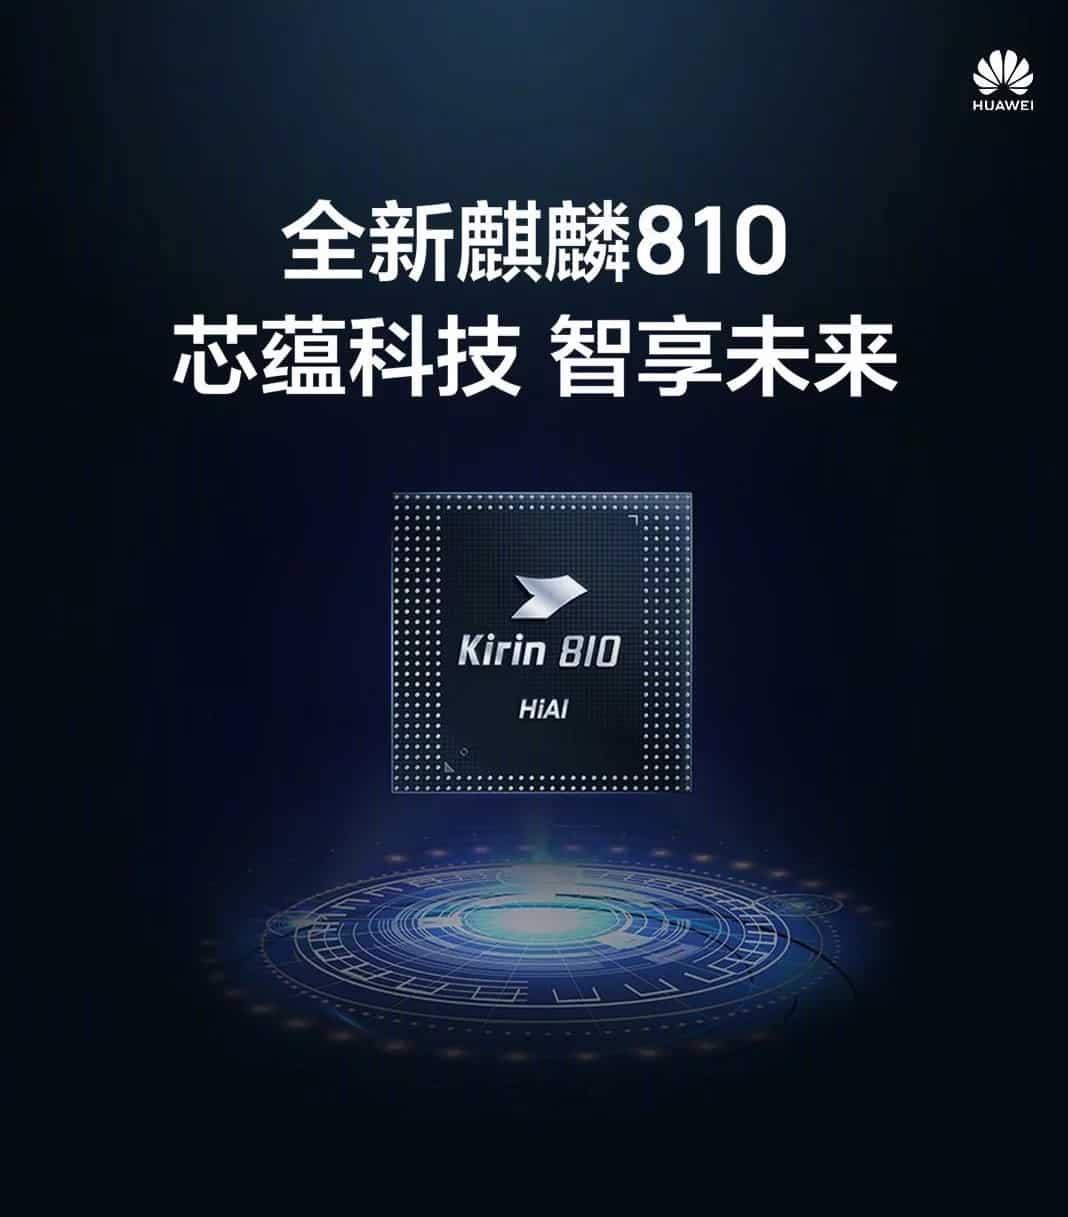 Huawei TSMC chipsets